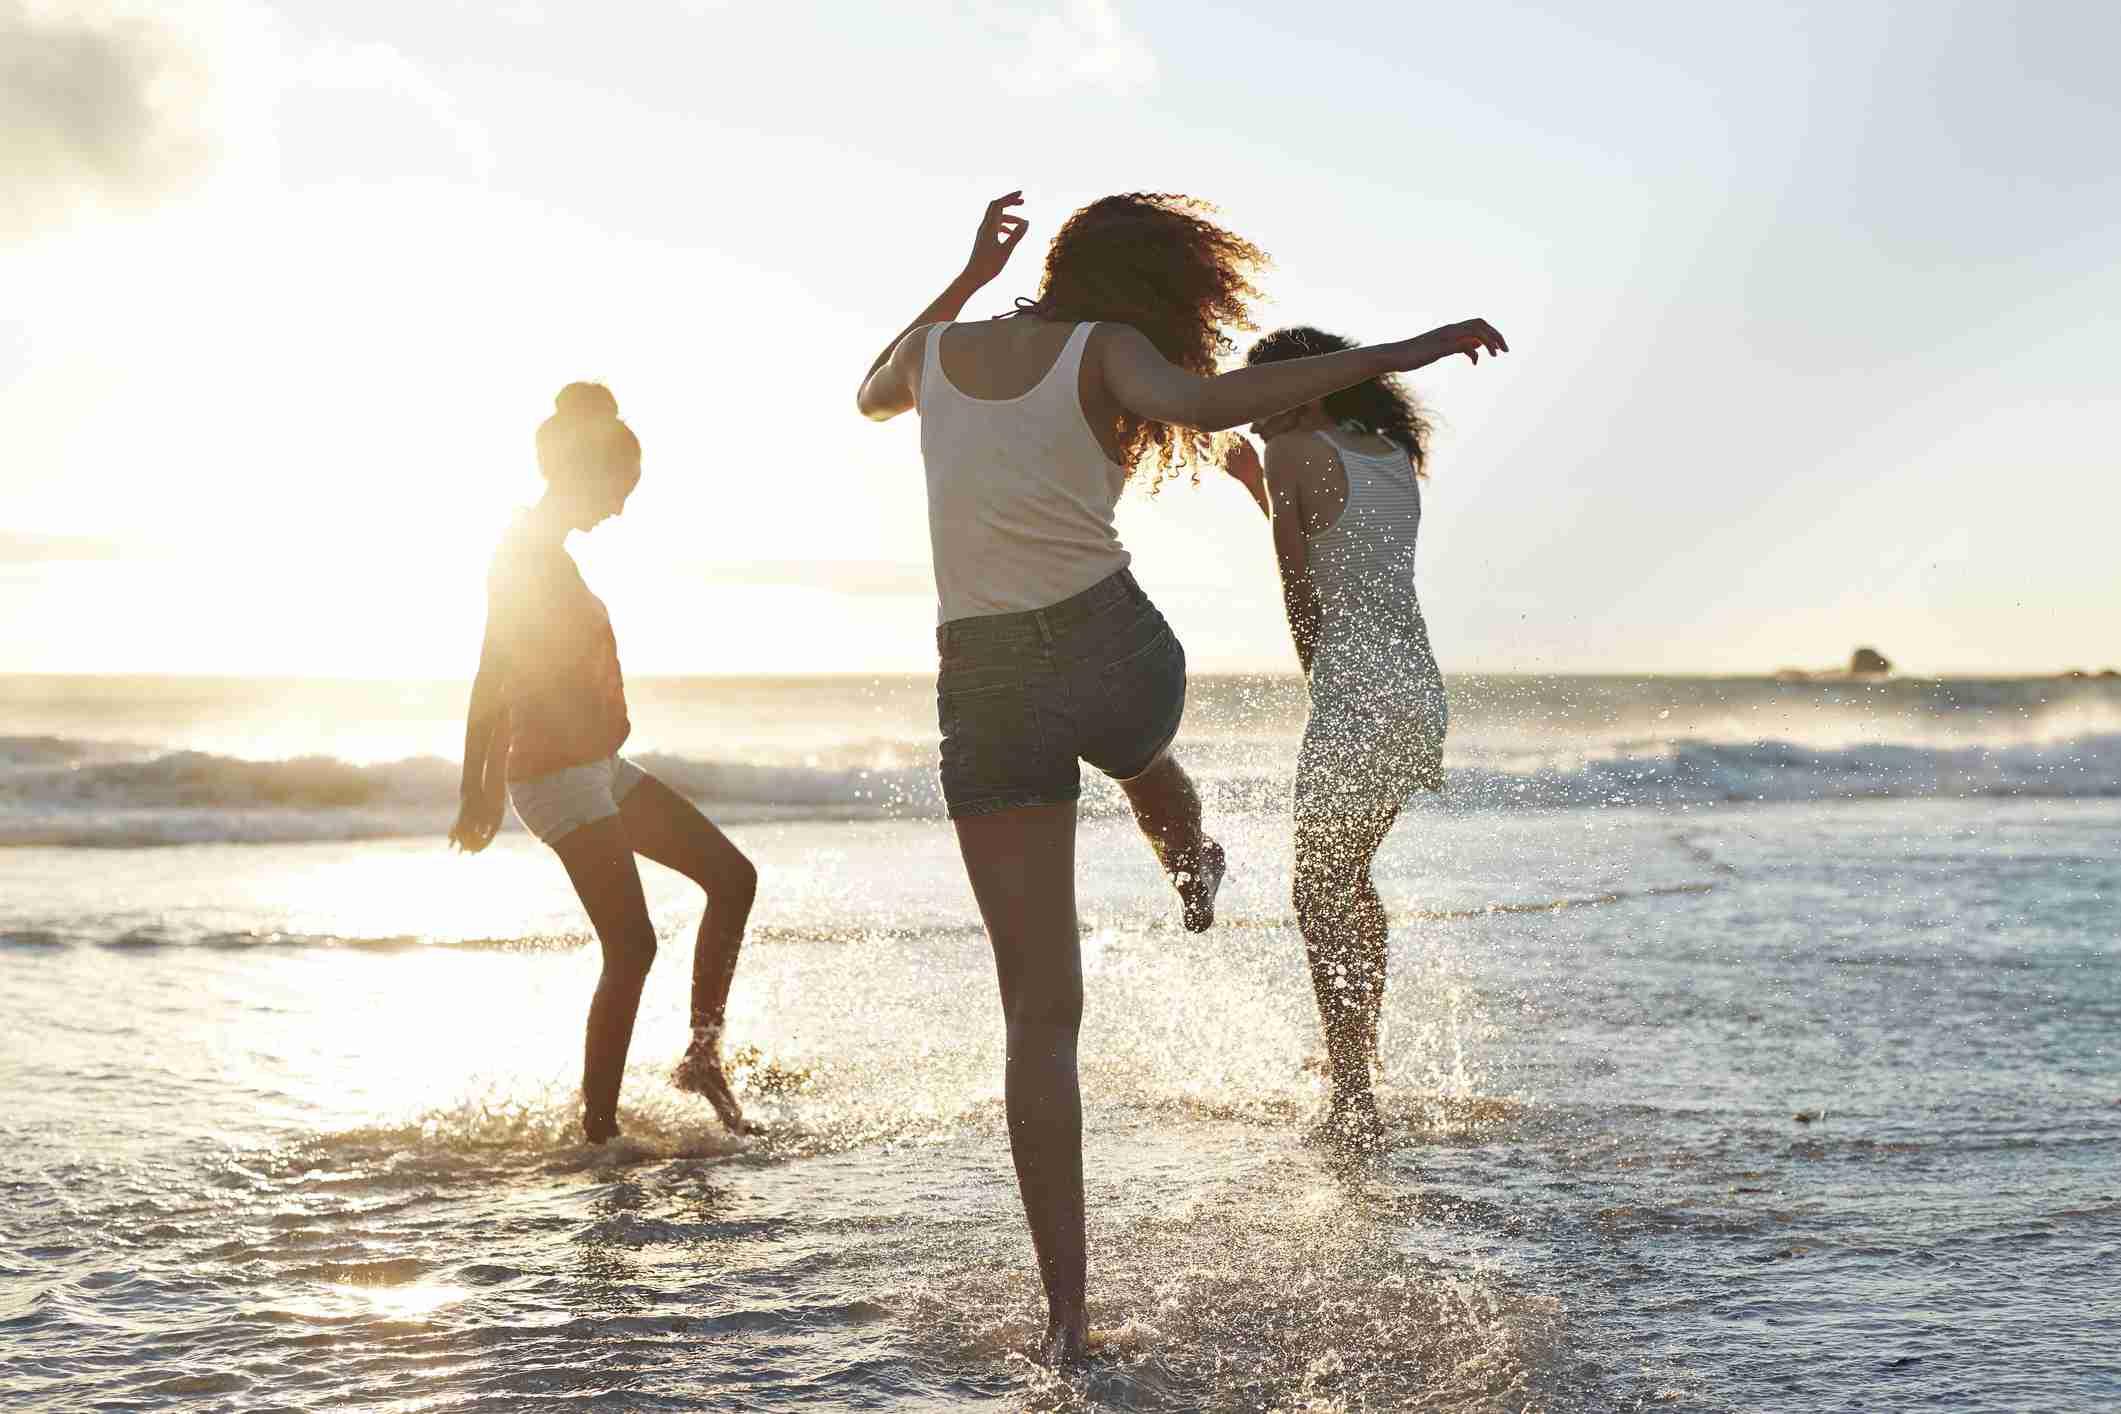 Three woman on the beach having fun